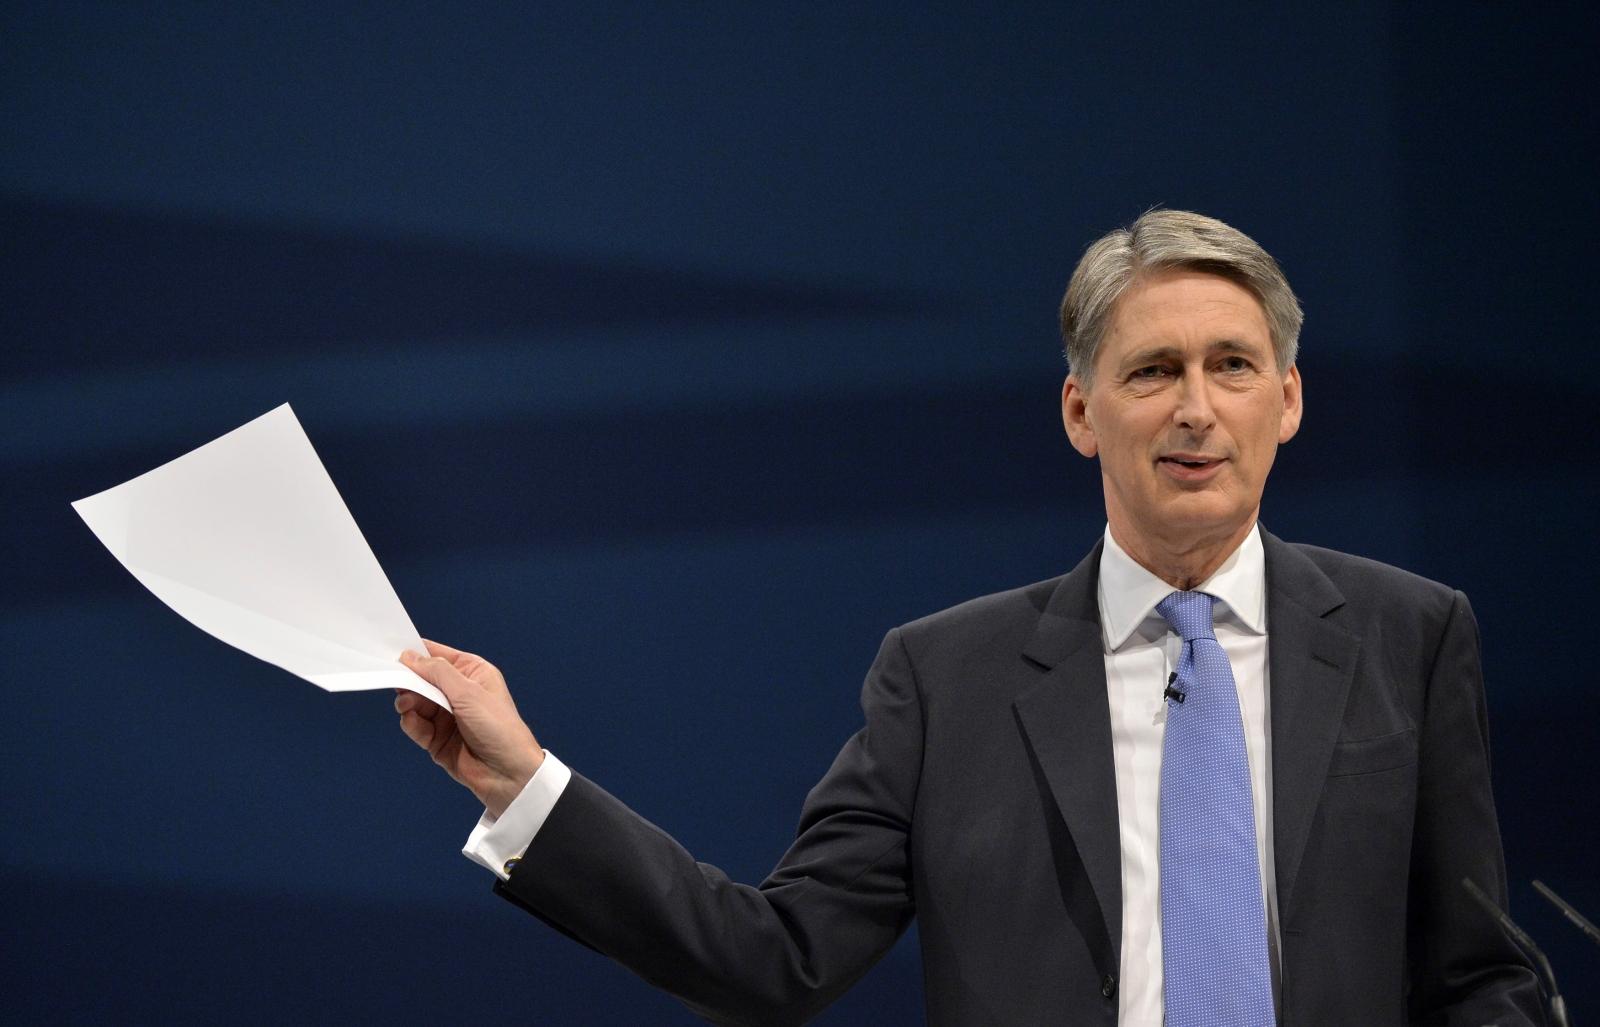 Phillip Hammond - Foreign Secretary